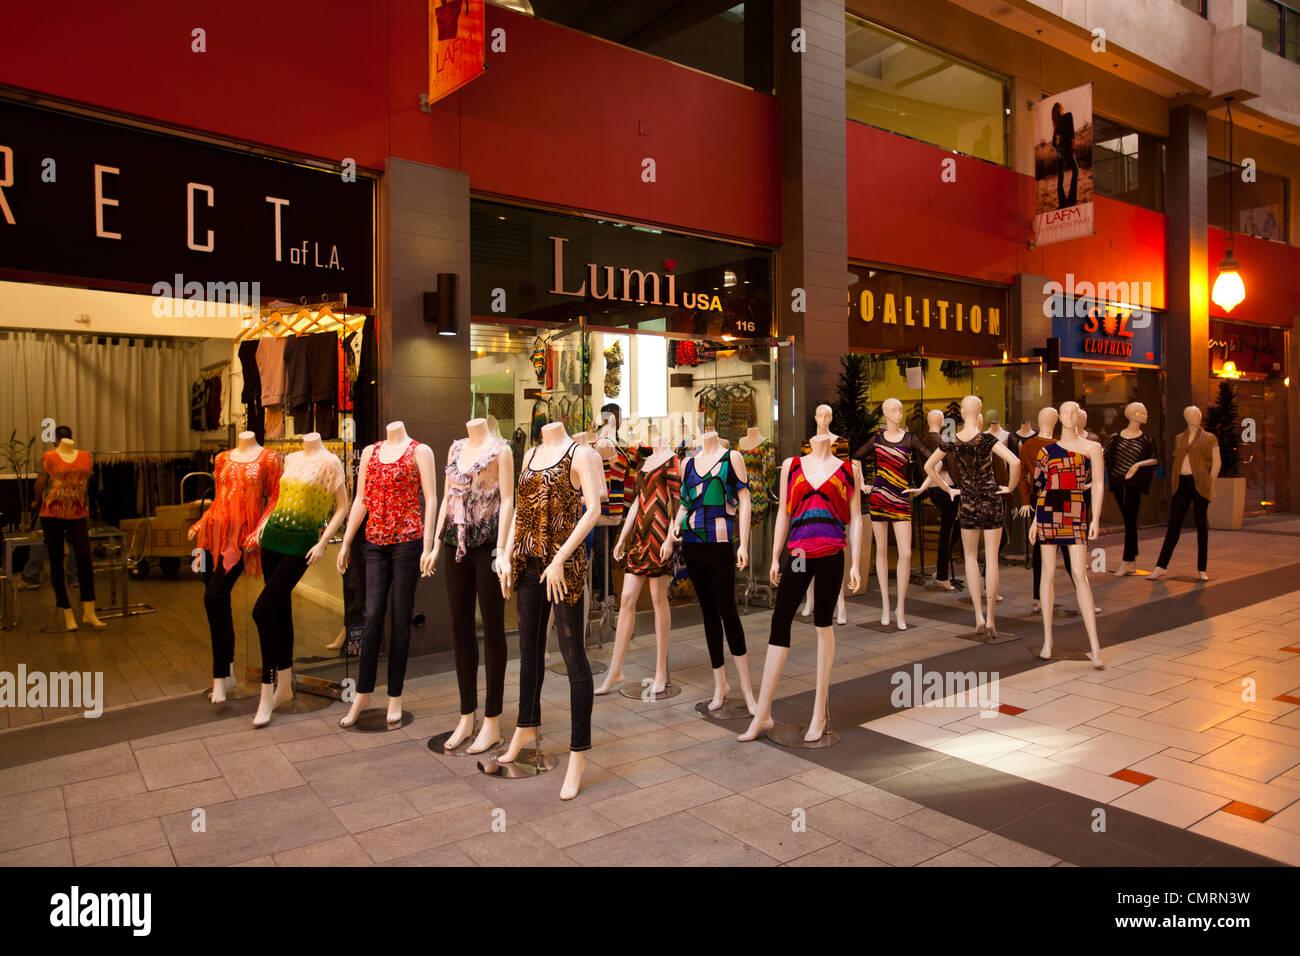 La la fashion district - Manikins Fashion District Downtown Los Angeles California Usa Stock Image